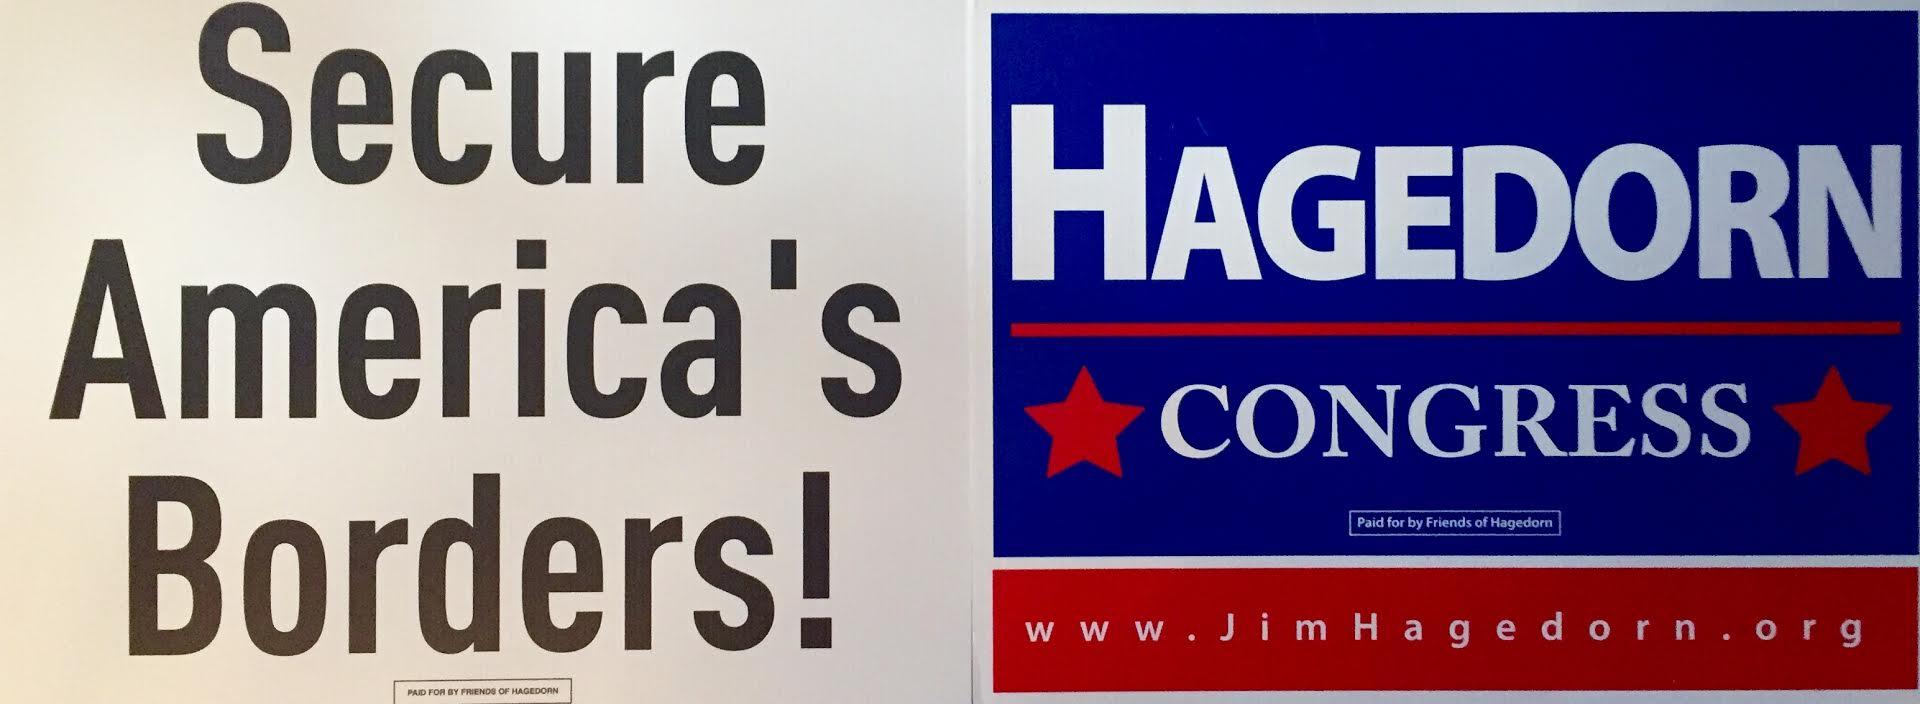 Secure America's Borders - Hagedorn